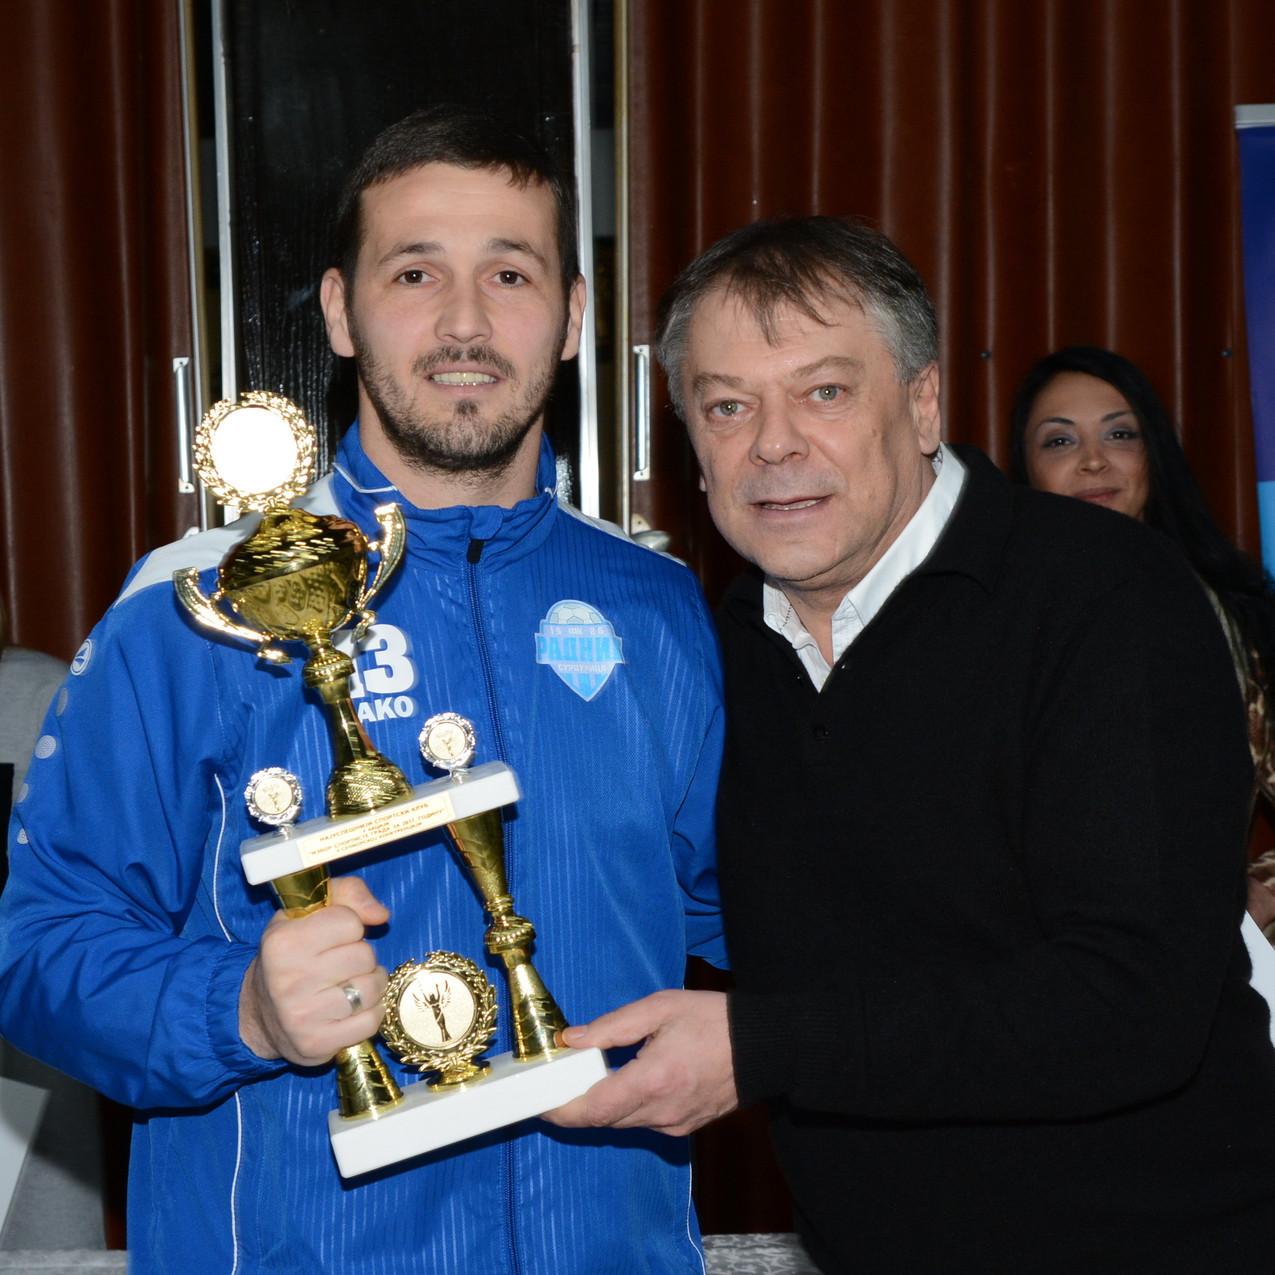 Najuspesniji sportski klub- pehar preuzeo kapiten Vladan Pavlovic